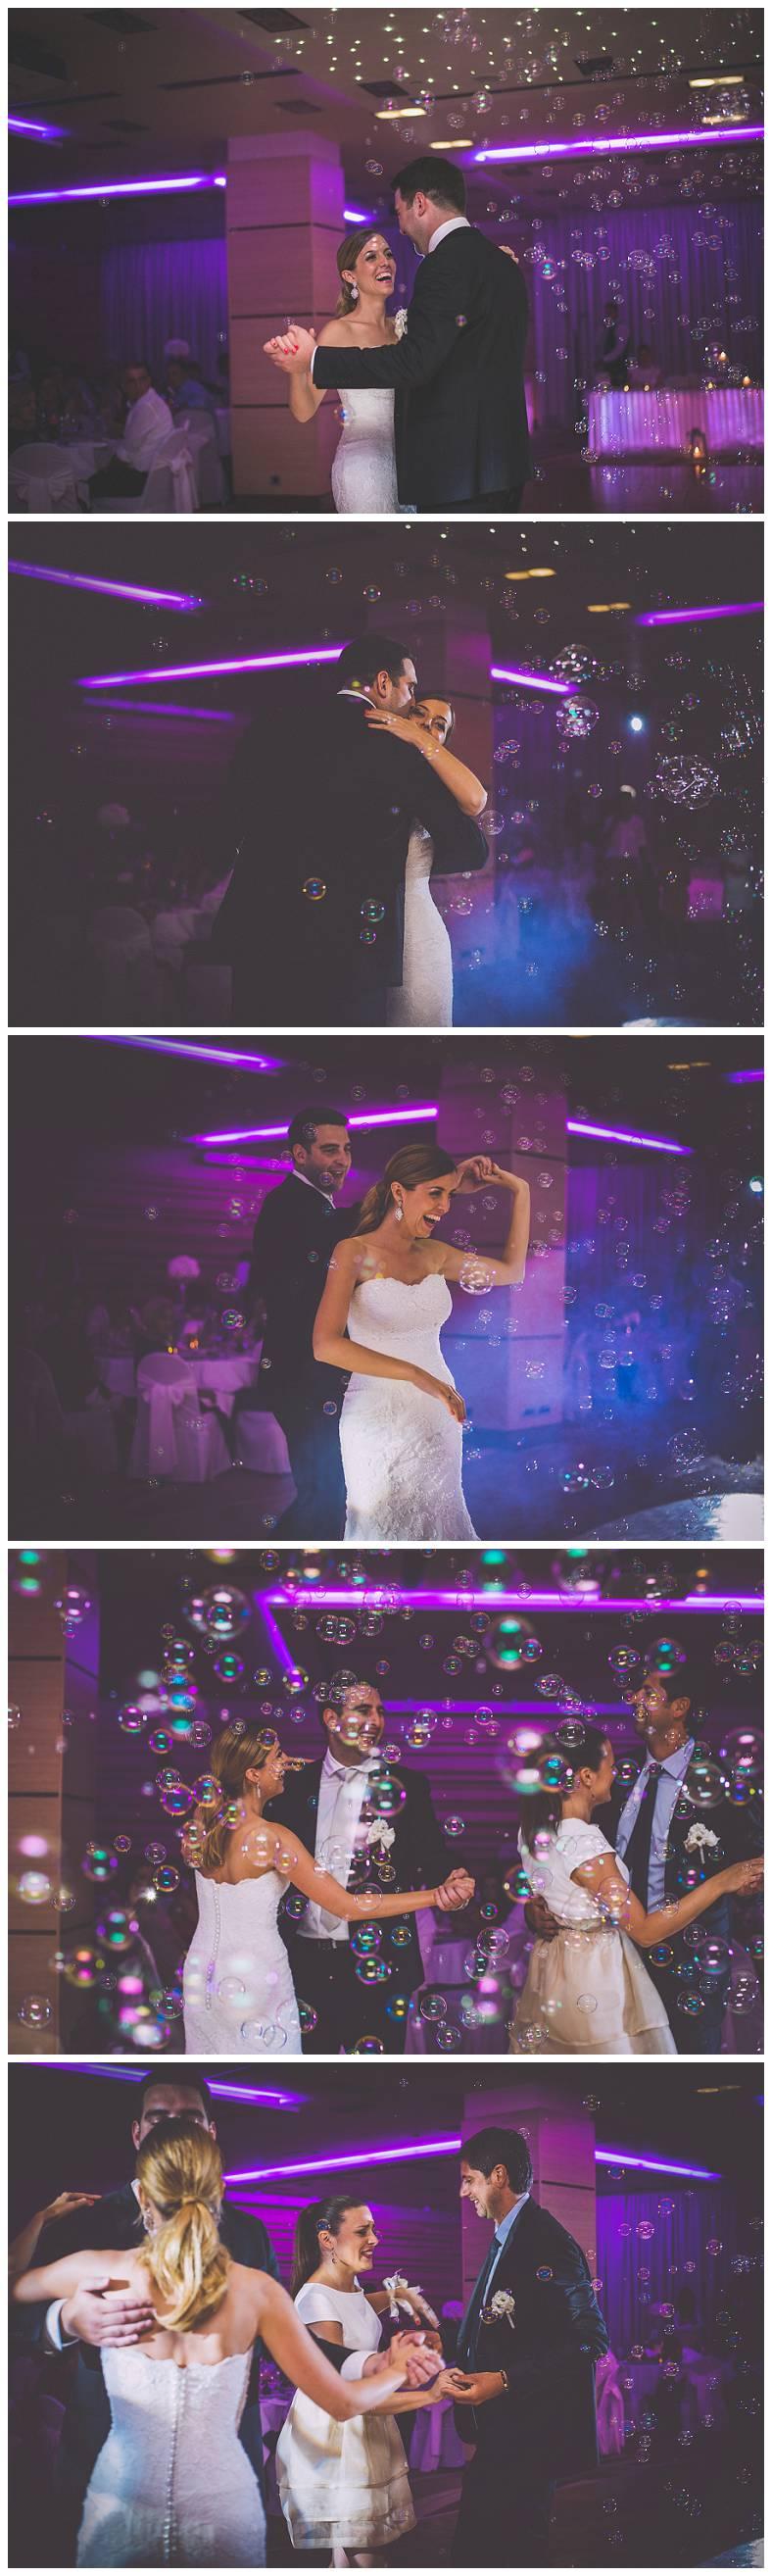 Prvi ples mladenaca u Hotelu Antunović